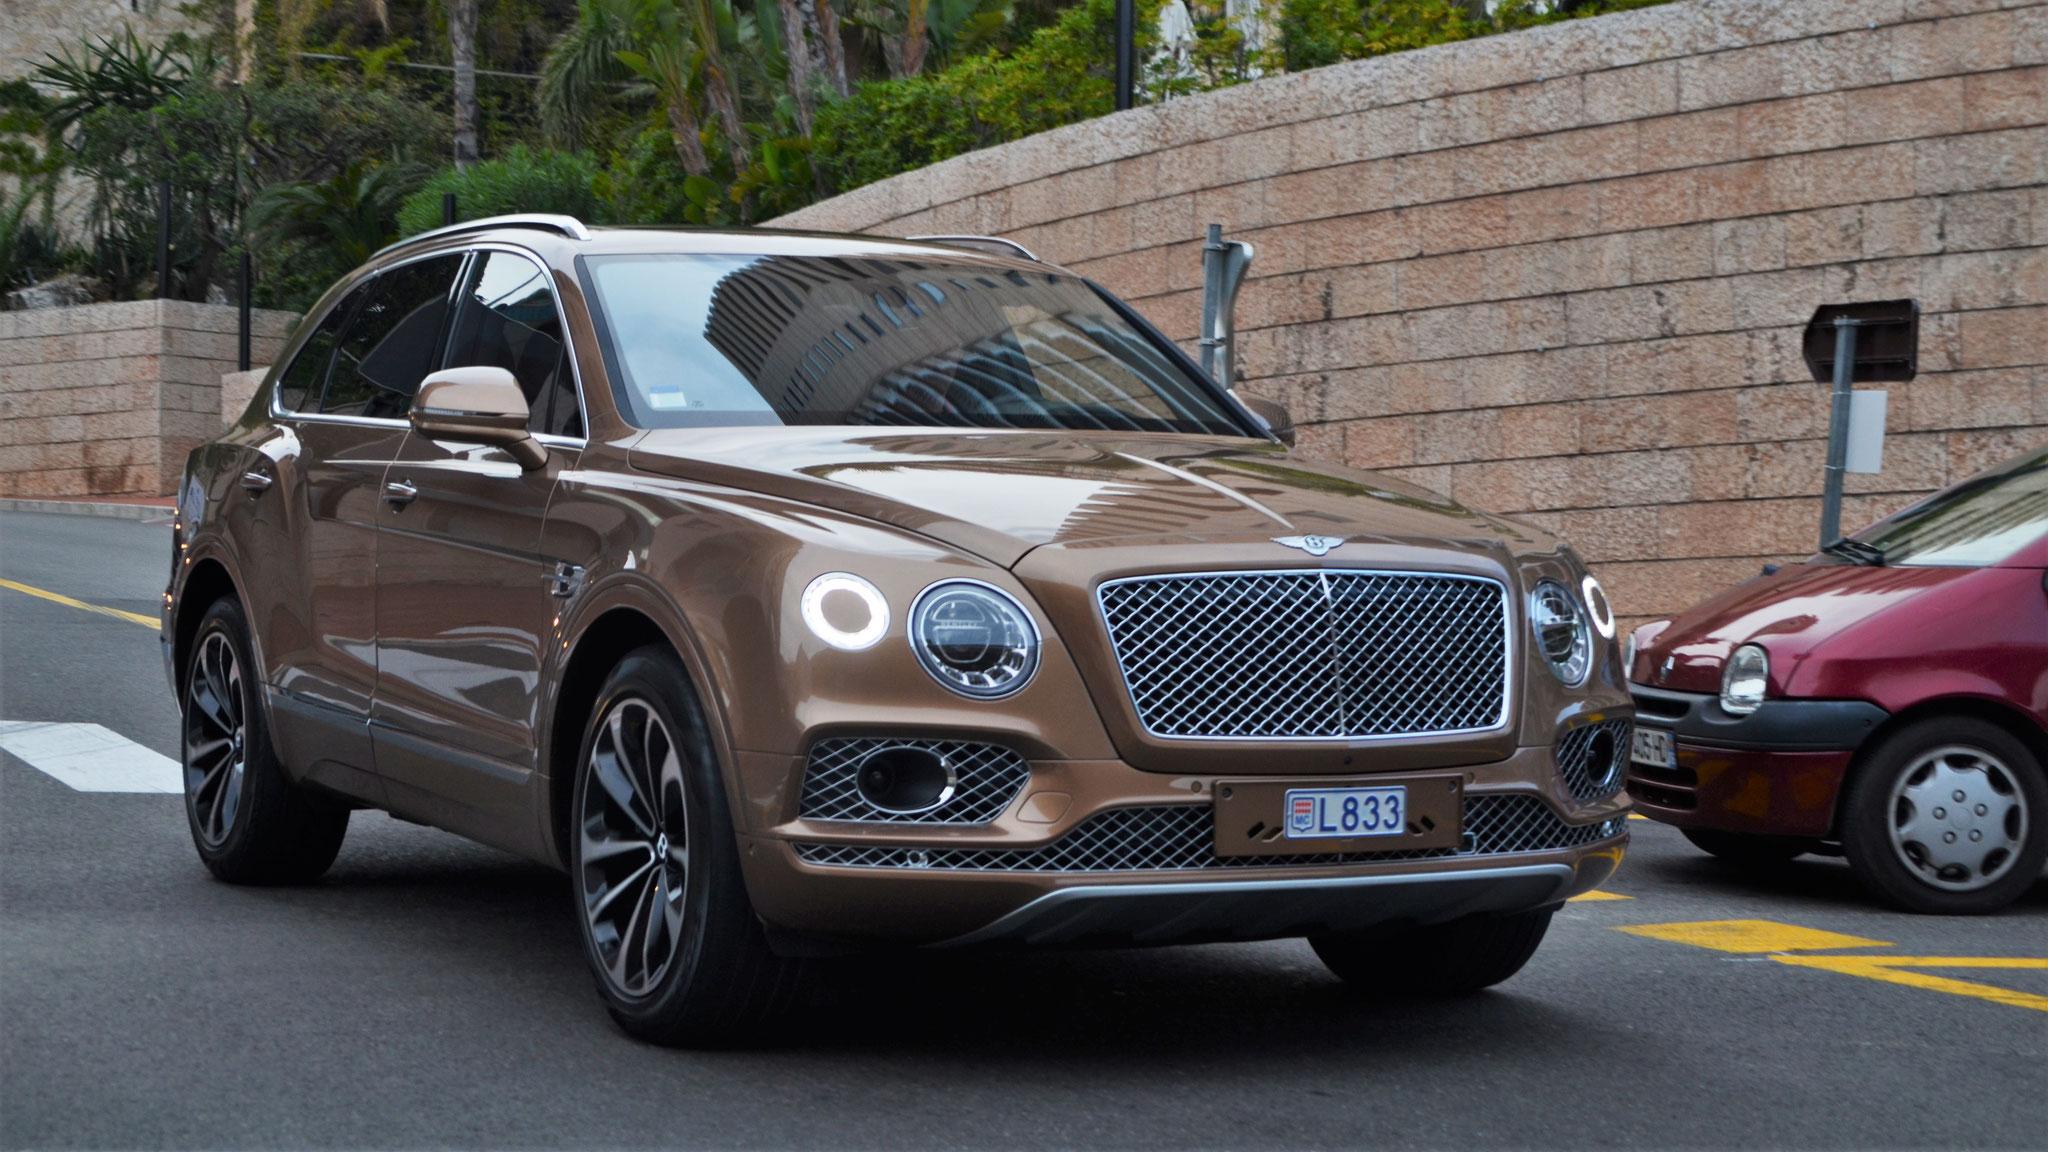 Bentley Bentayga - L833 (MC)